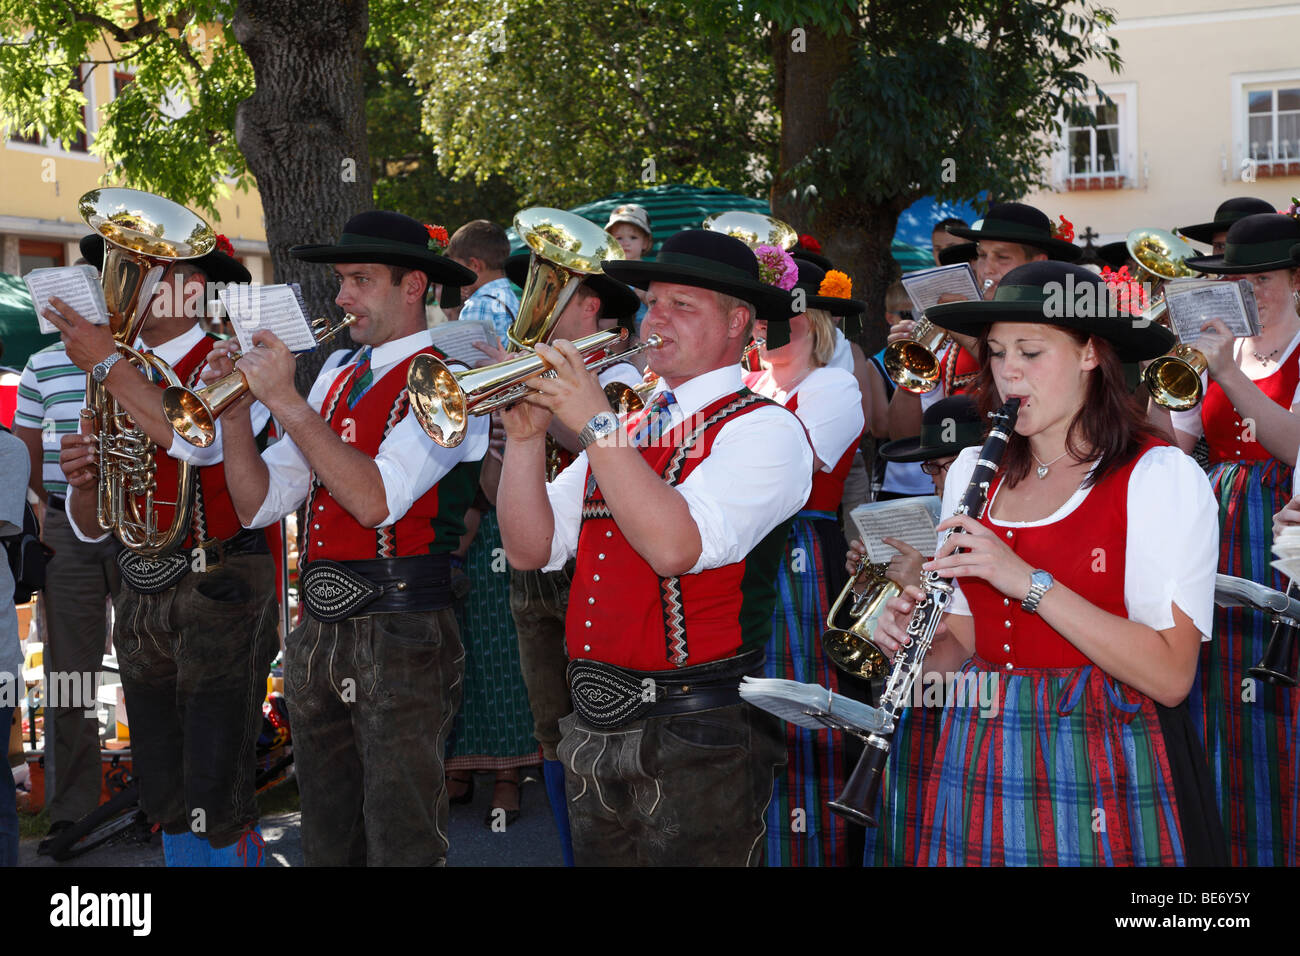 Folk music band at the Samson Parade in Mariapfarr, Lungau, Salzburg state, Salzburg, Austria, Europe - Stock Image